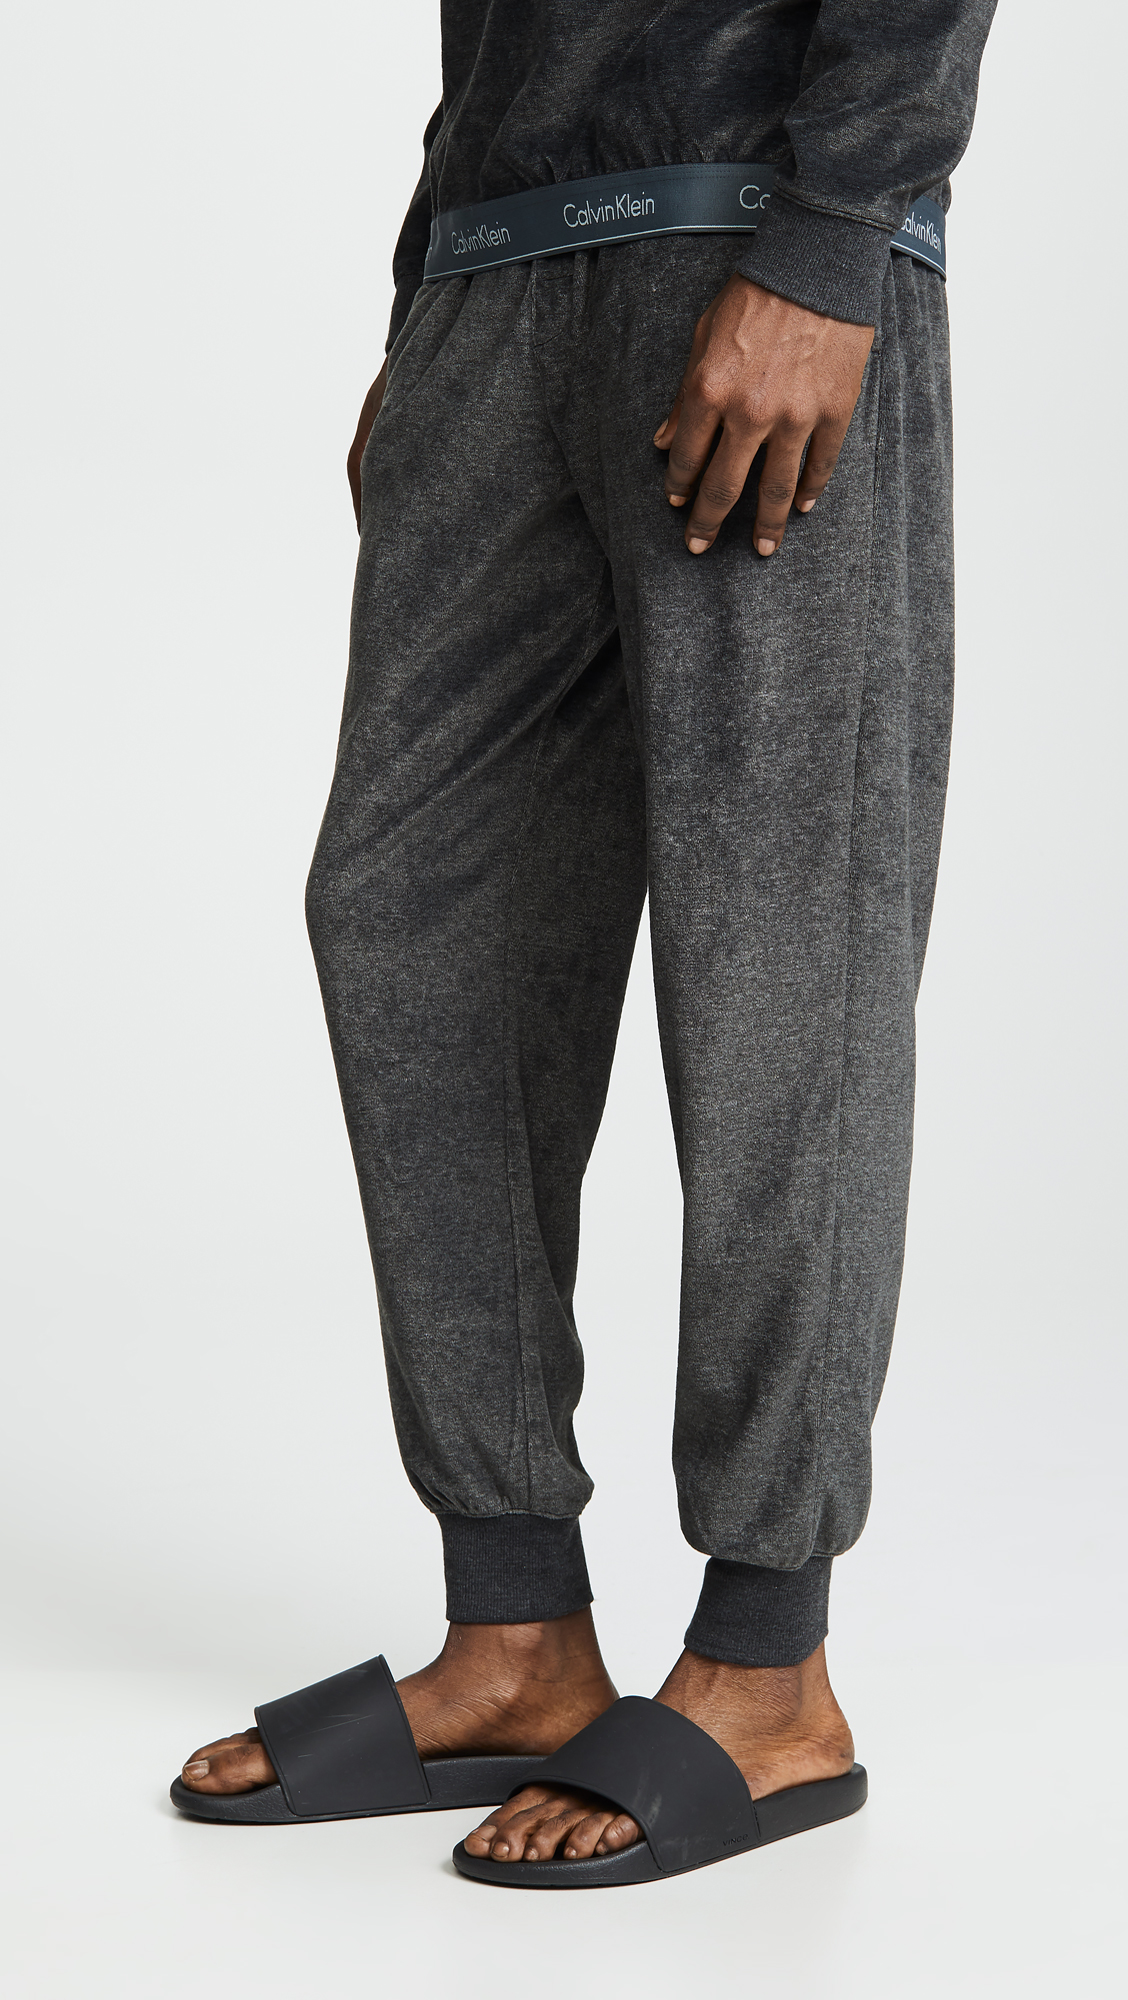 488aa02fb48338 Calvin Klein Underwear Modern Cotton Stretch Velour Jogger Pants ...